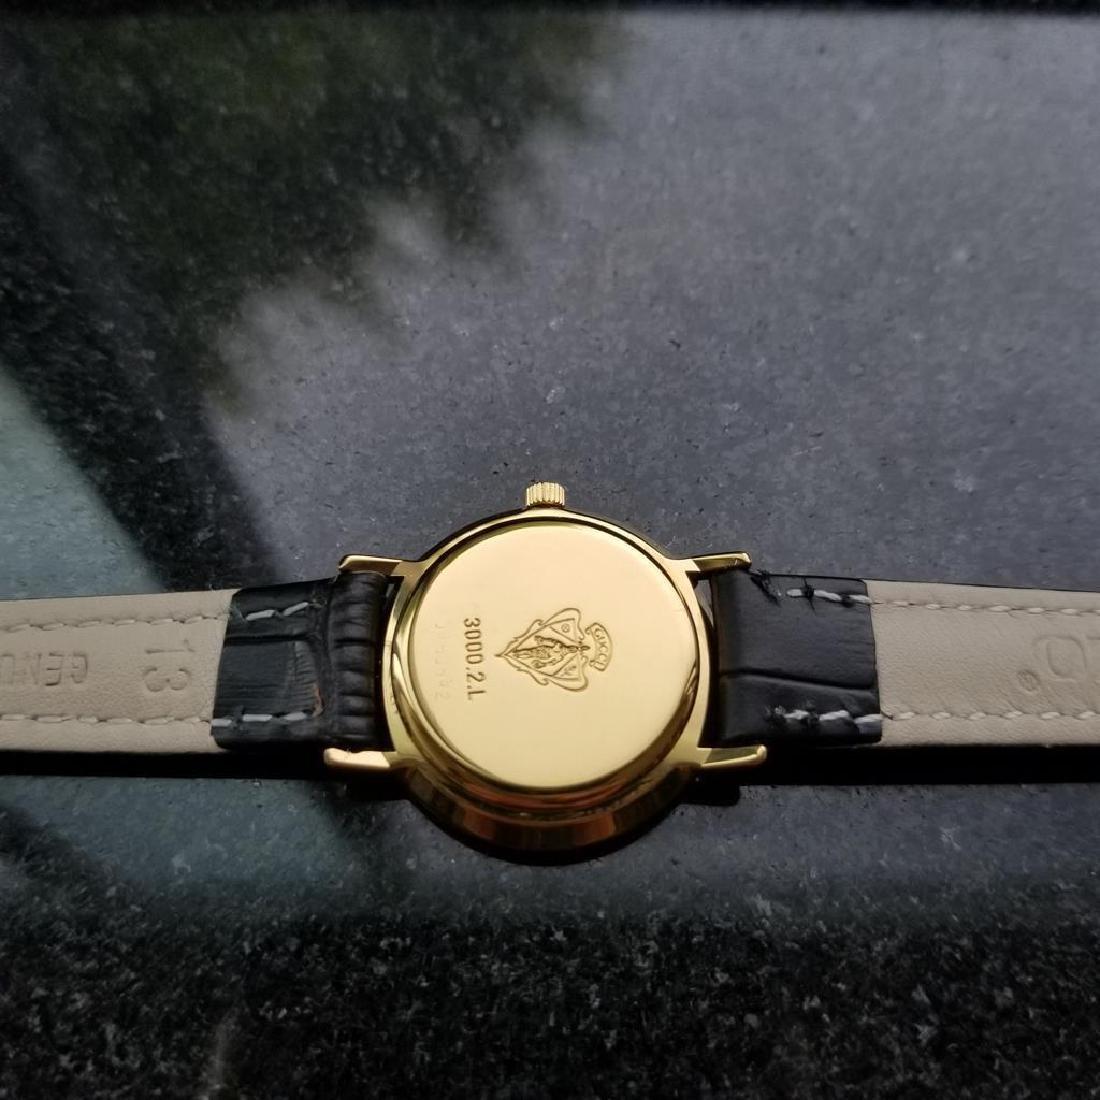 GUCCI Ladies Gold-Plated 3000.2.L Lux Swiss Dress Watch - 9